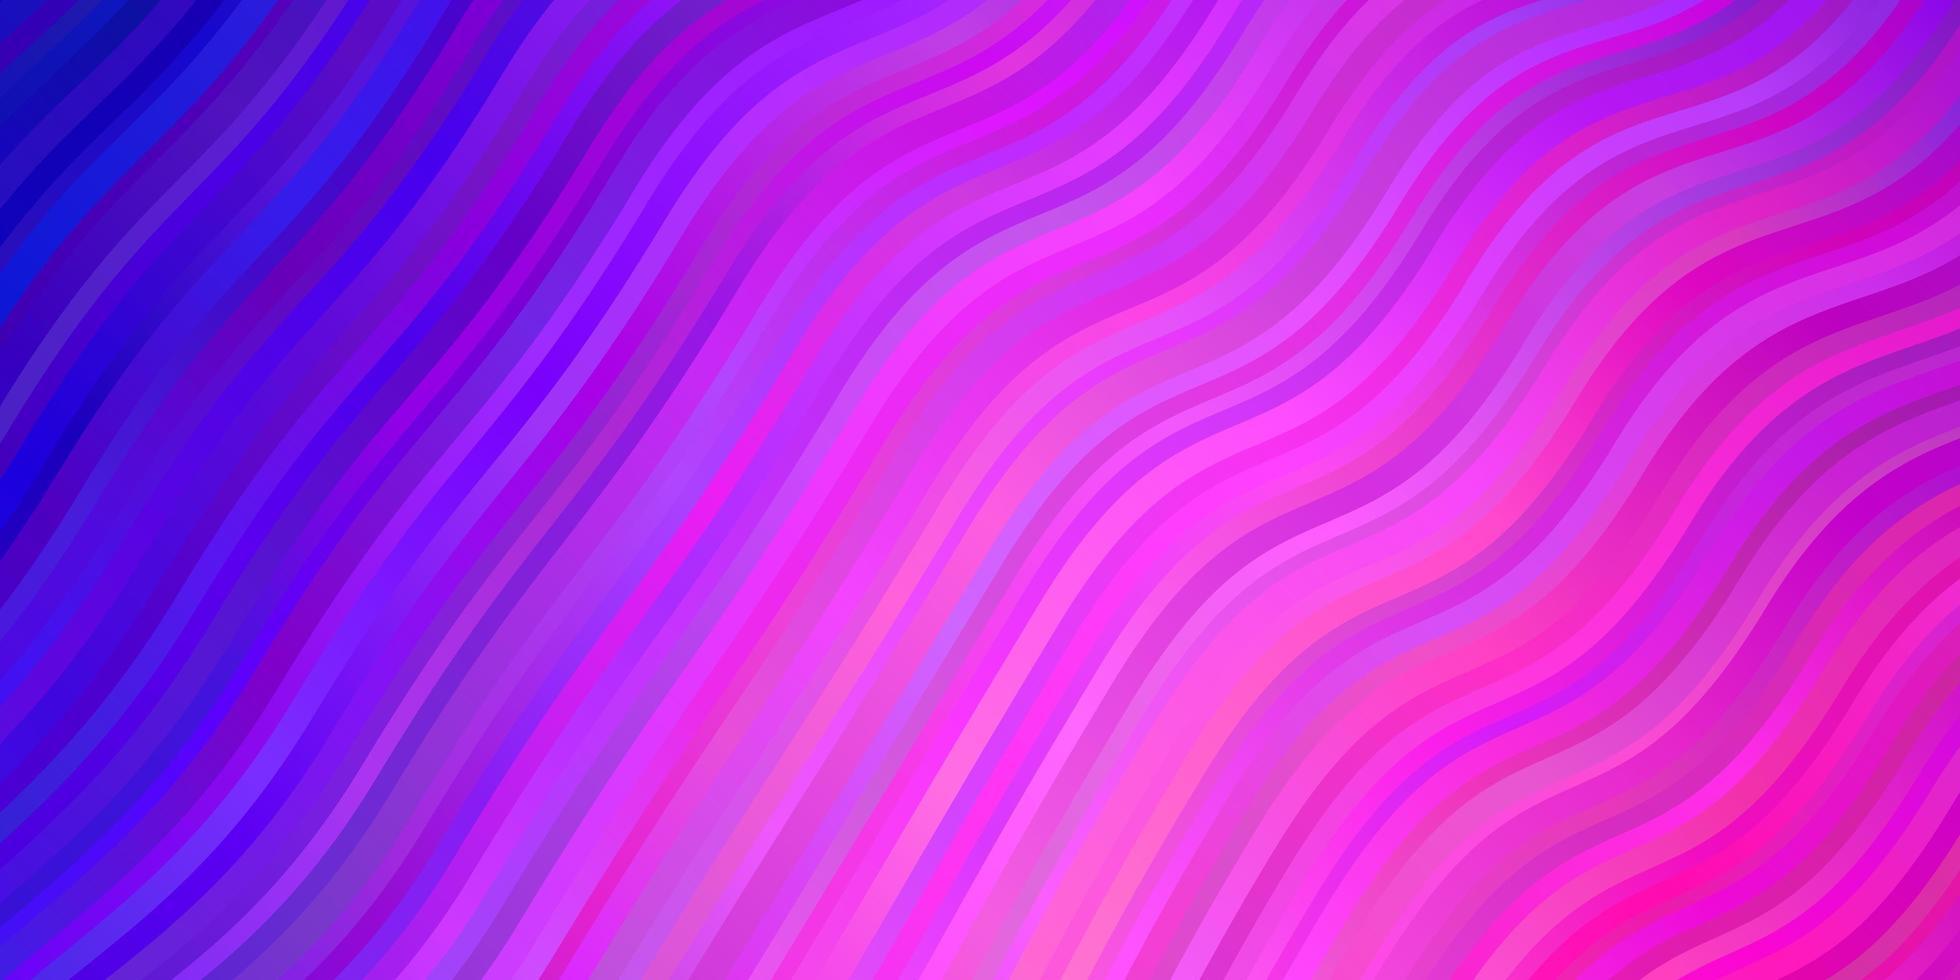 hellviolettes, rosa Vektorlayout mit Kreisbogen. vektor